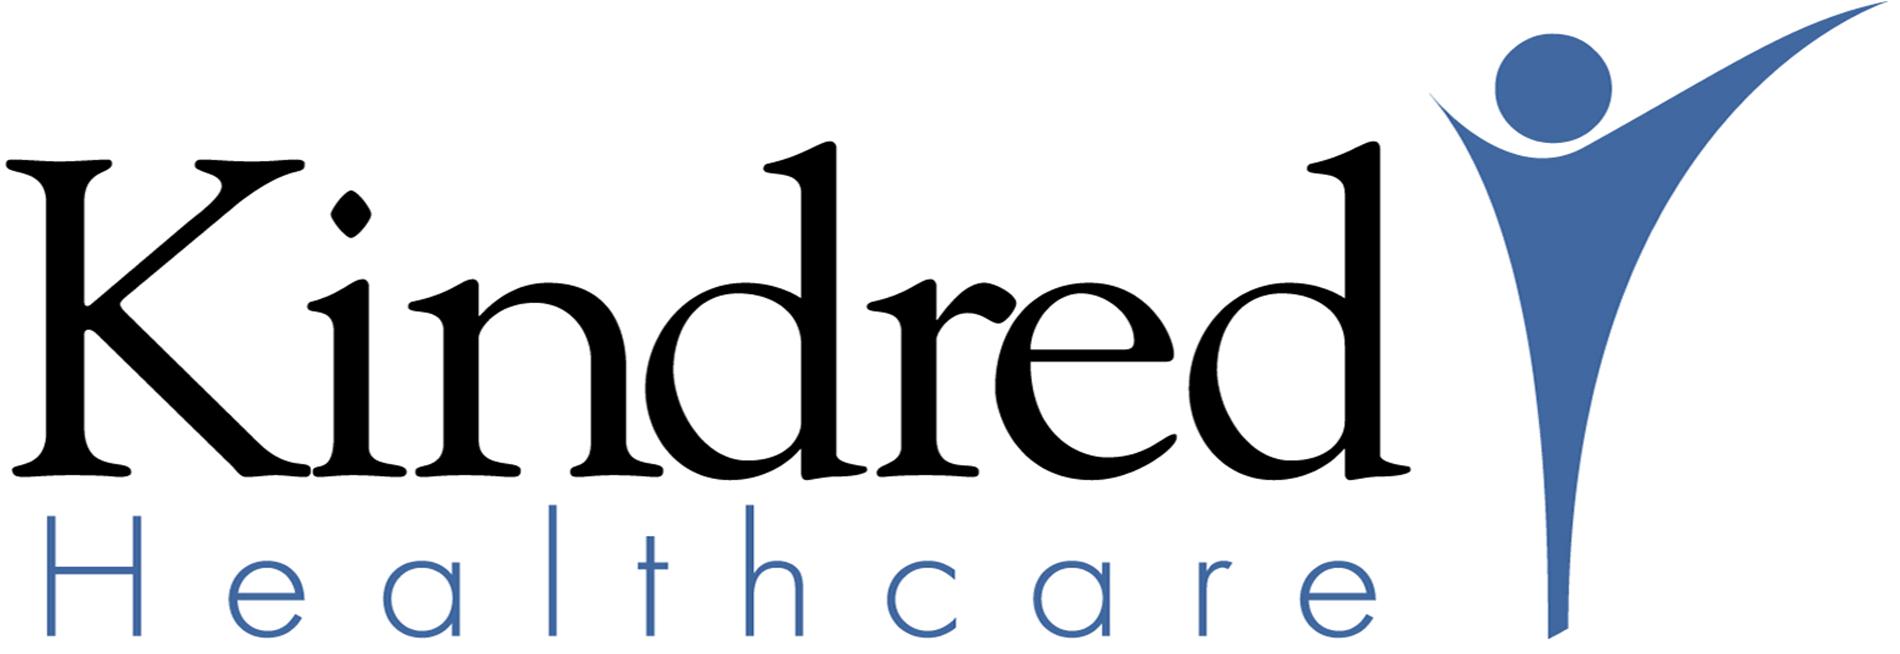 KindredHealthcare.